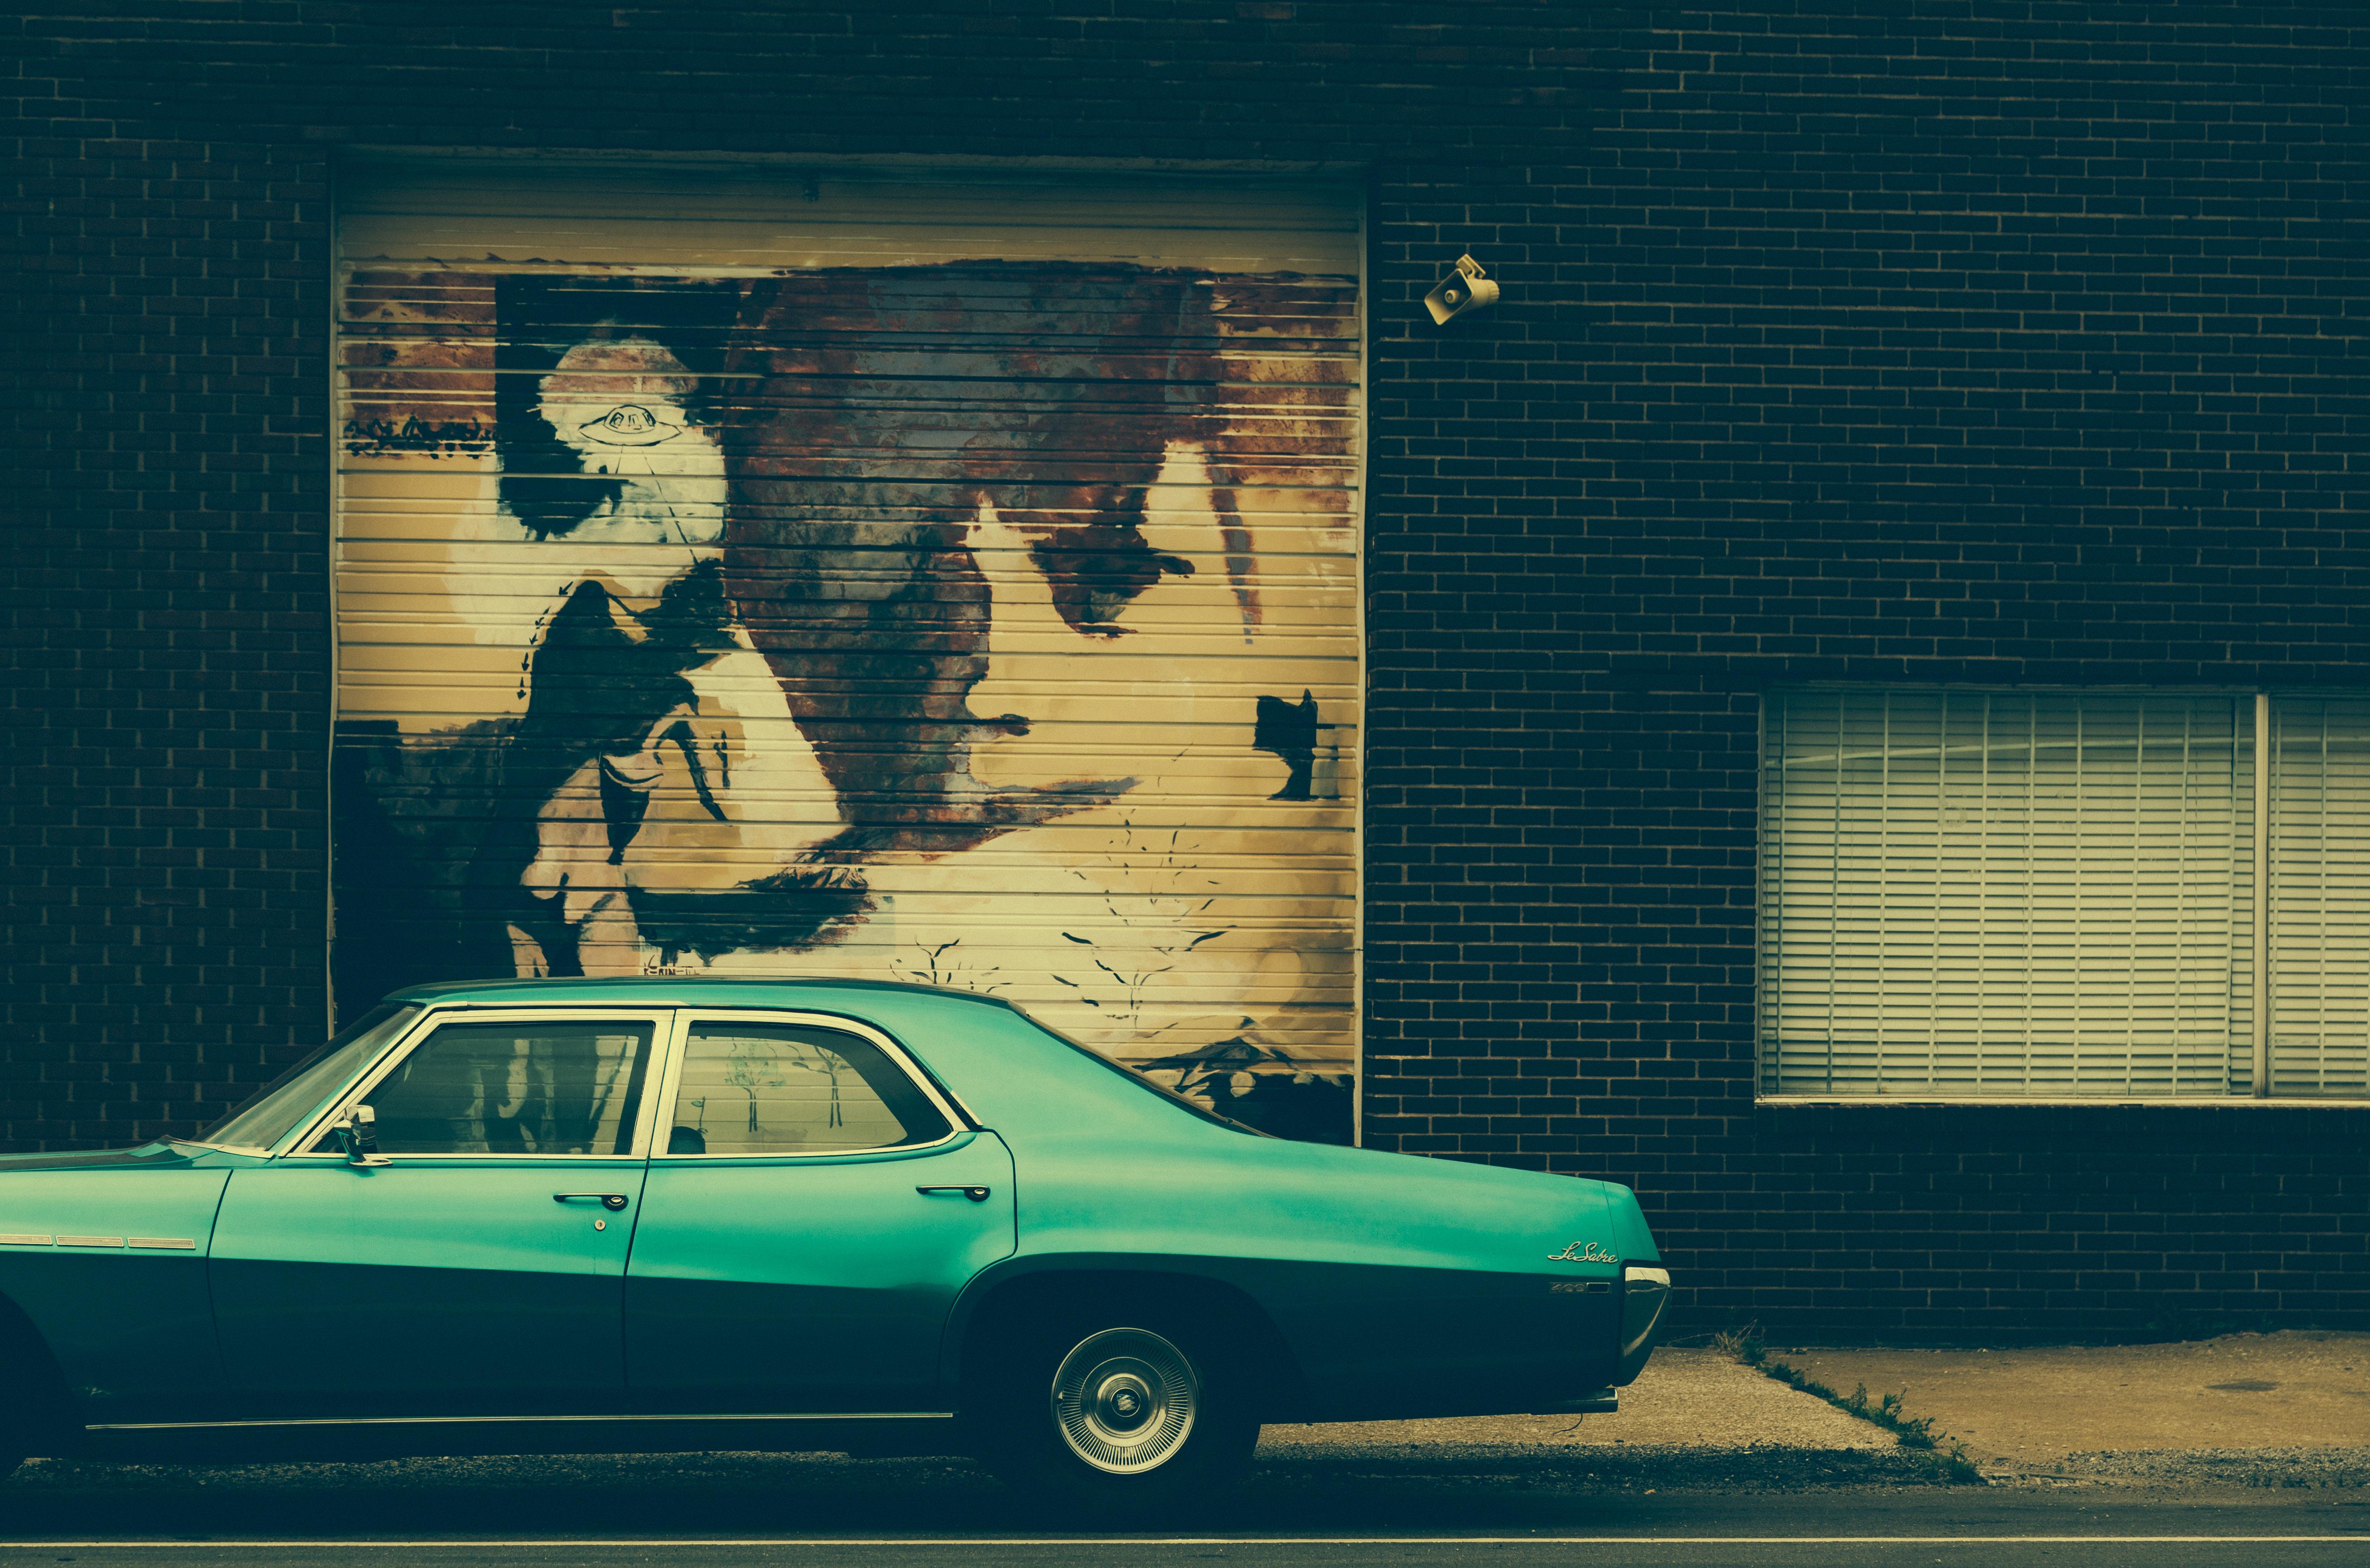 Wallpaper : sky, wall, Canon, Buick, graffiti, Vintage car, criminal